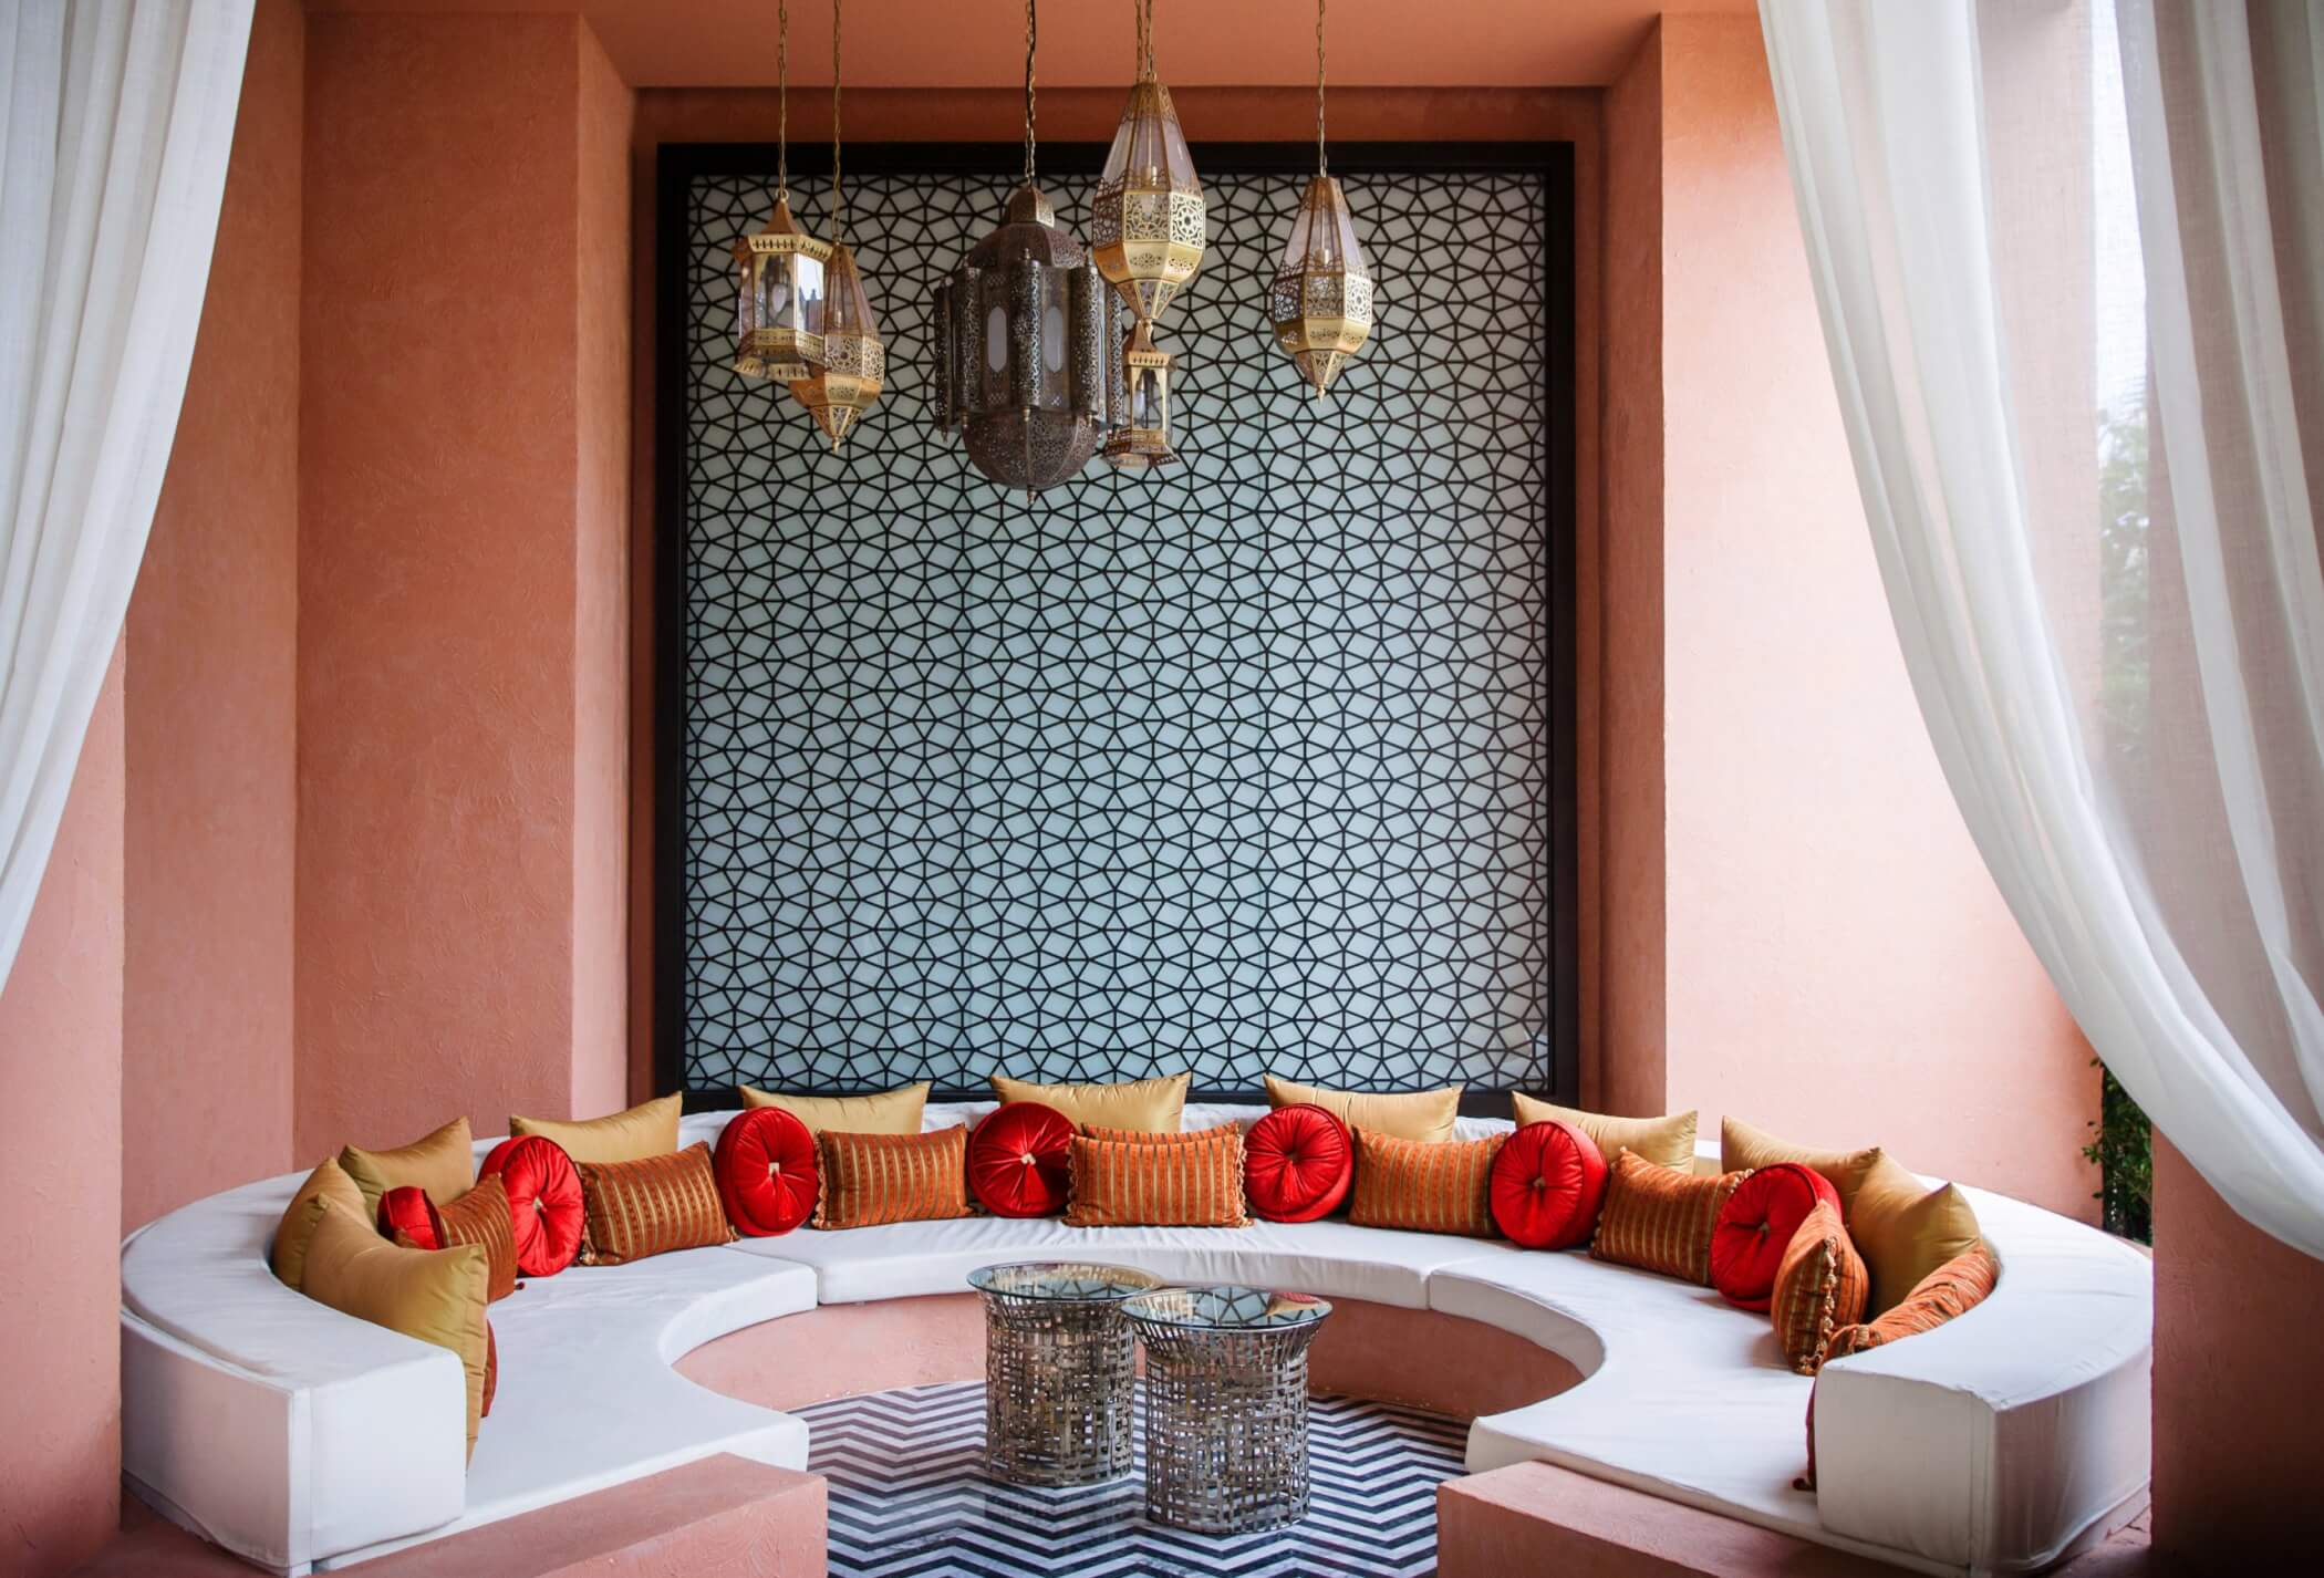 Moroccan-villa-style-california-room-remodel